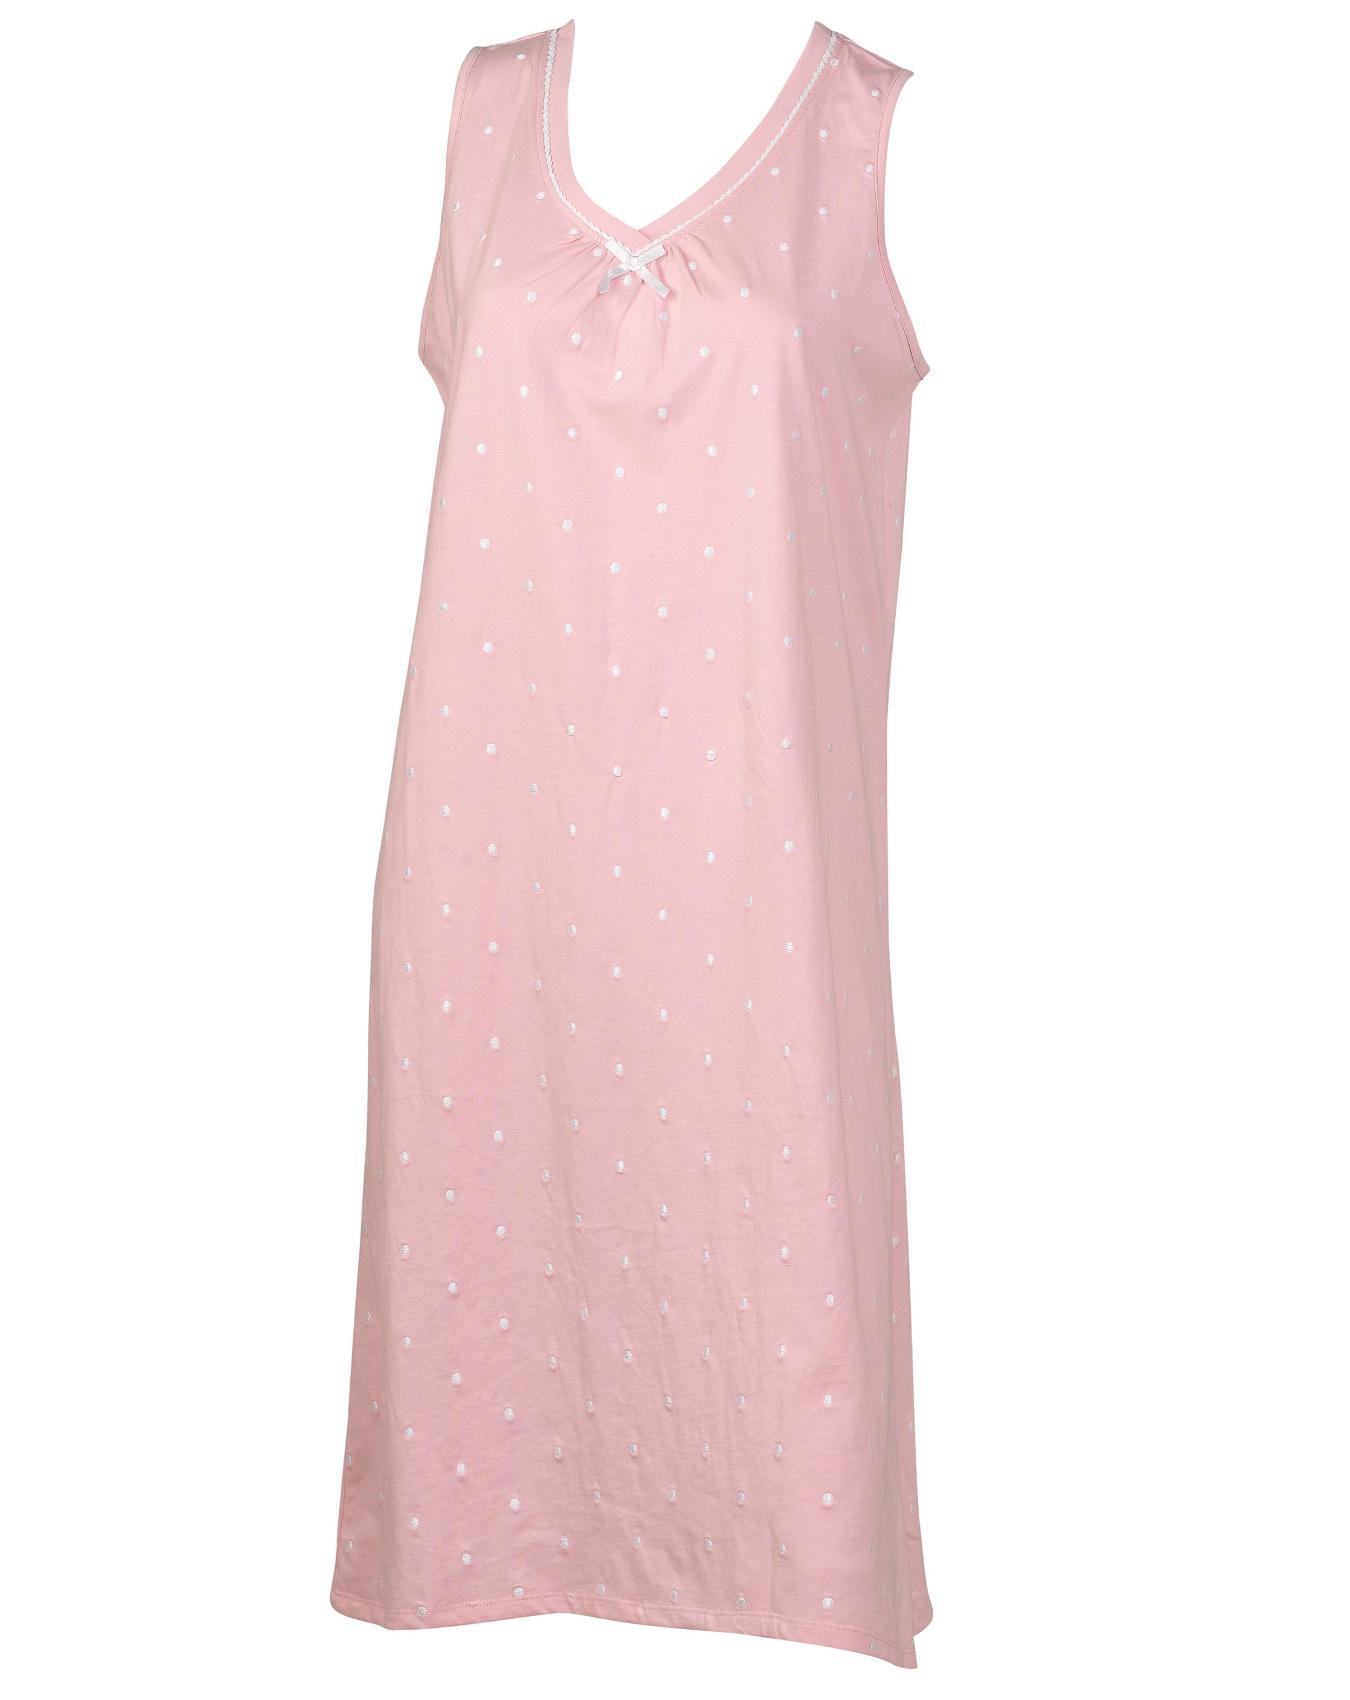 Ladies slenderella sleeveless nightdress embroidered polka